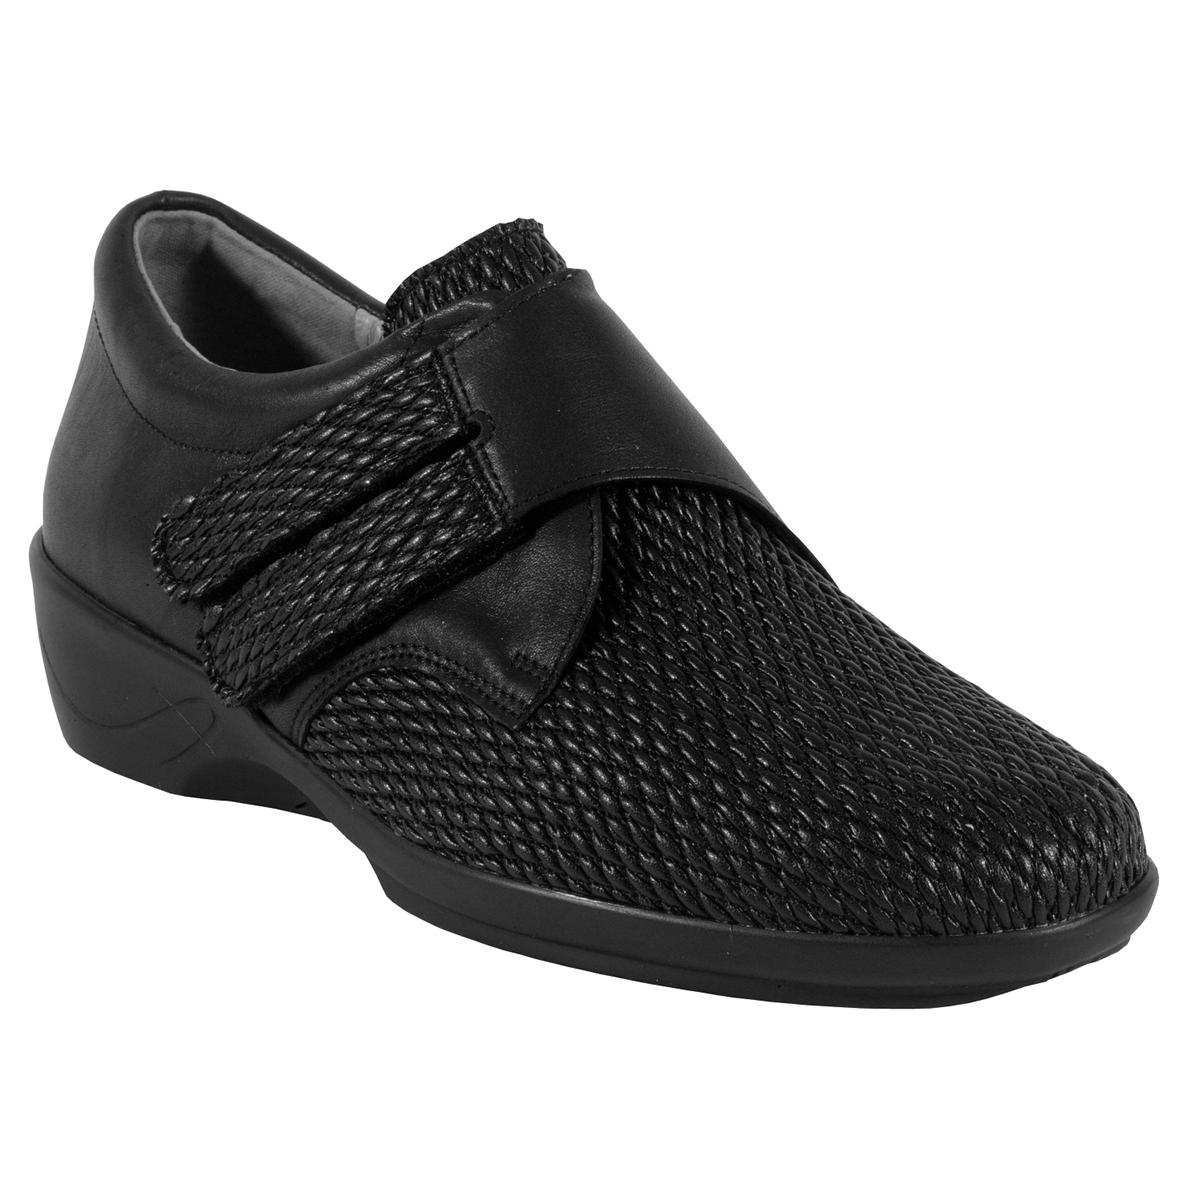 Pc Pharmacie Chaussures Confort De Femme Franklin Gala Chut Mad KlcJF1